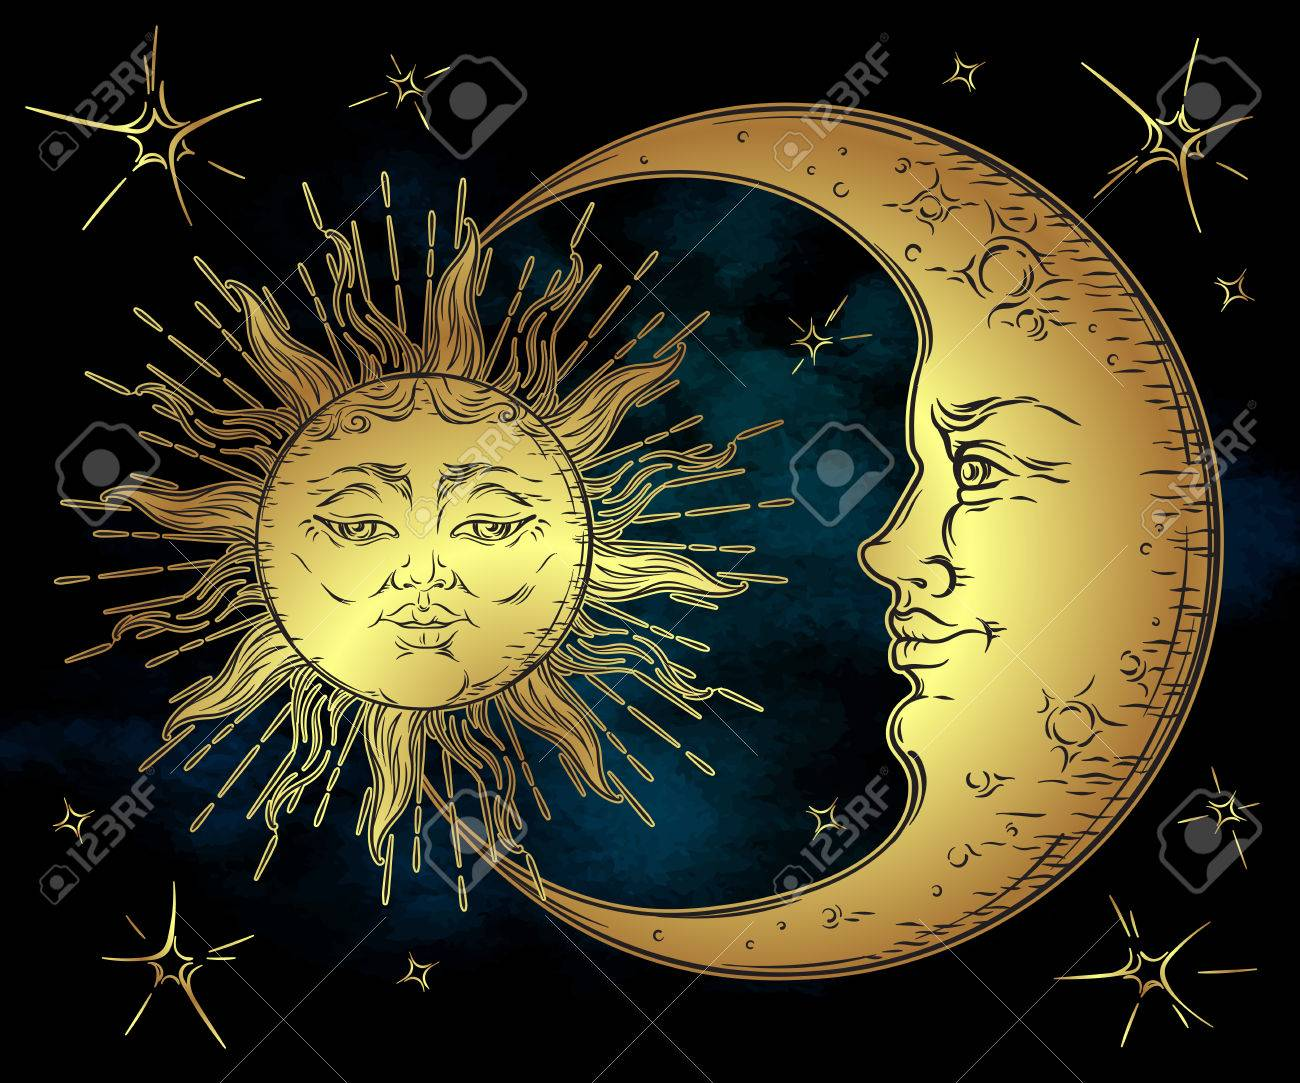 Antique style hand drawn art golden sun, crescent moon and stars over blue black sky. Boho chic tattoo design vector illustration - 68807060